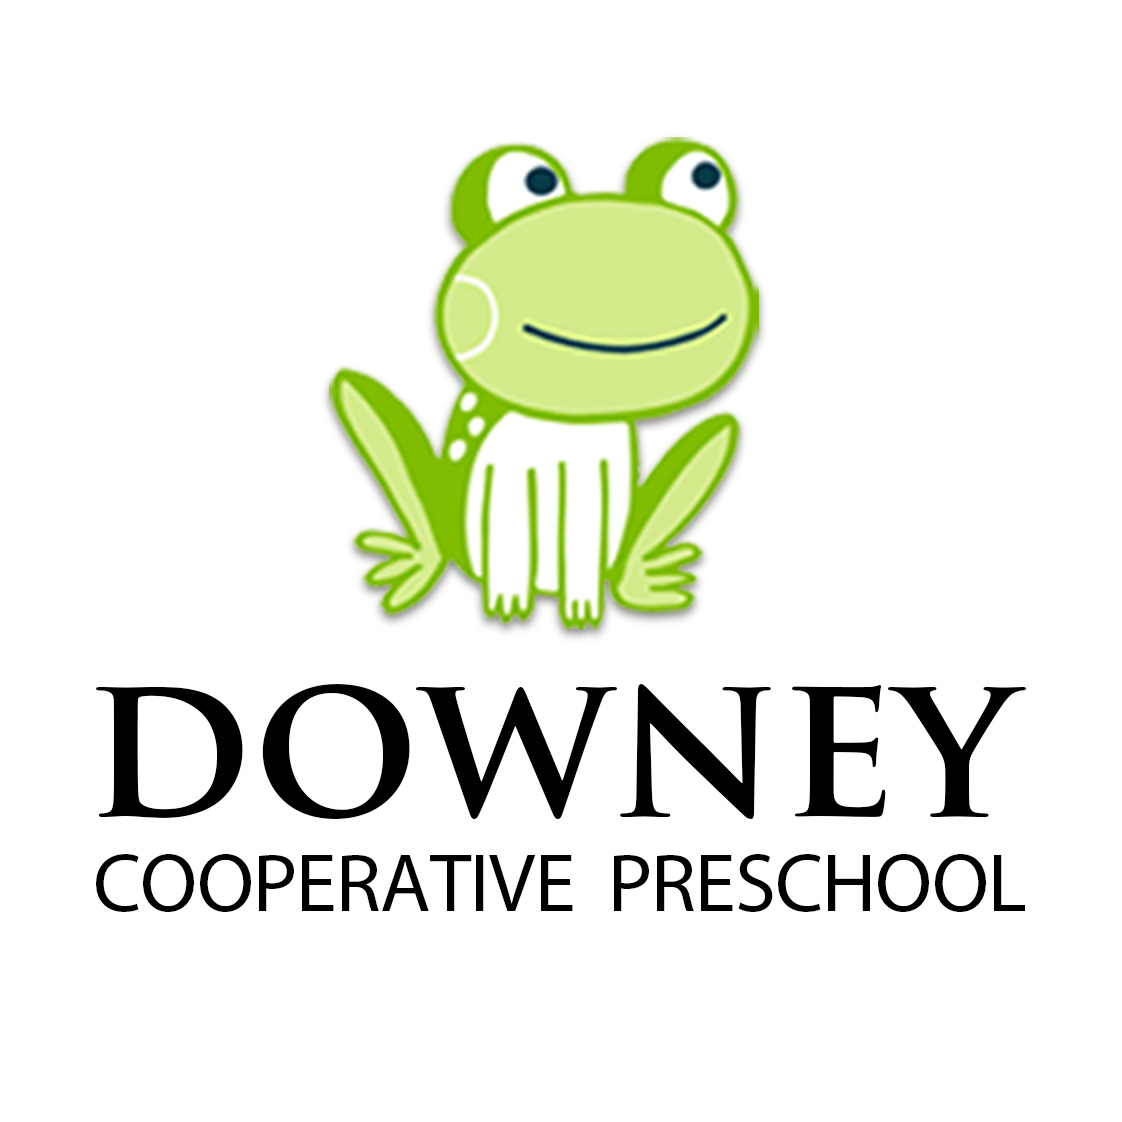 Downey Cooperative Preschool Logo